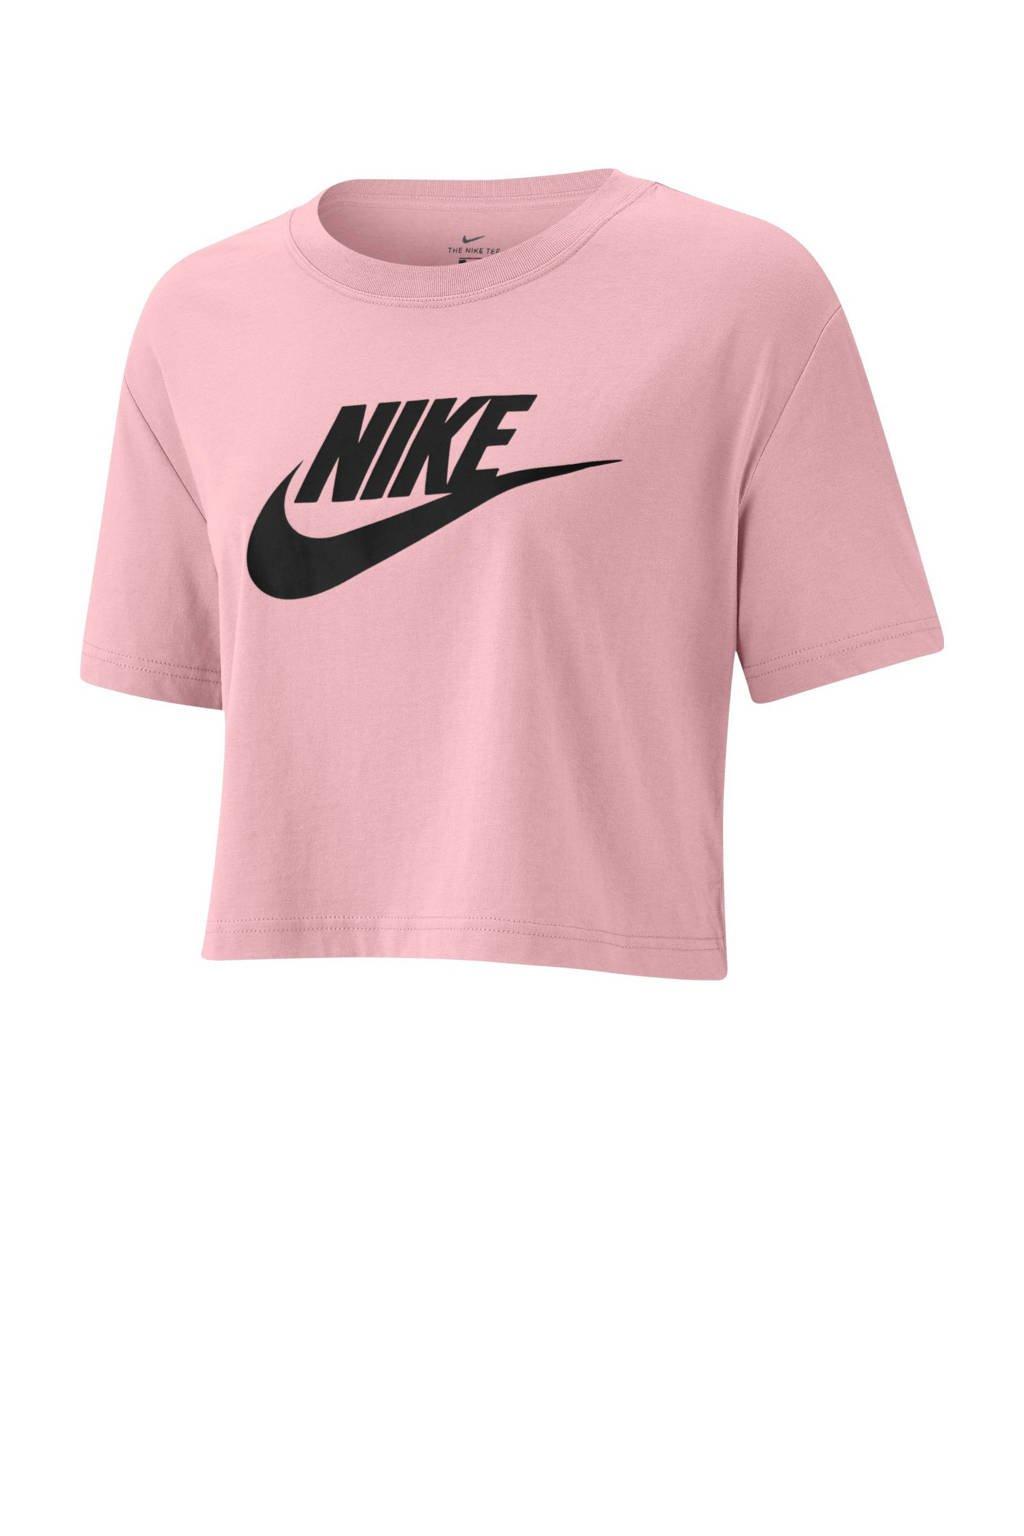 Nike T-shirt met logo roze/zwart, Roze/zwart